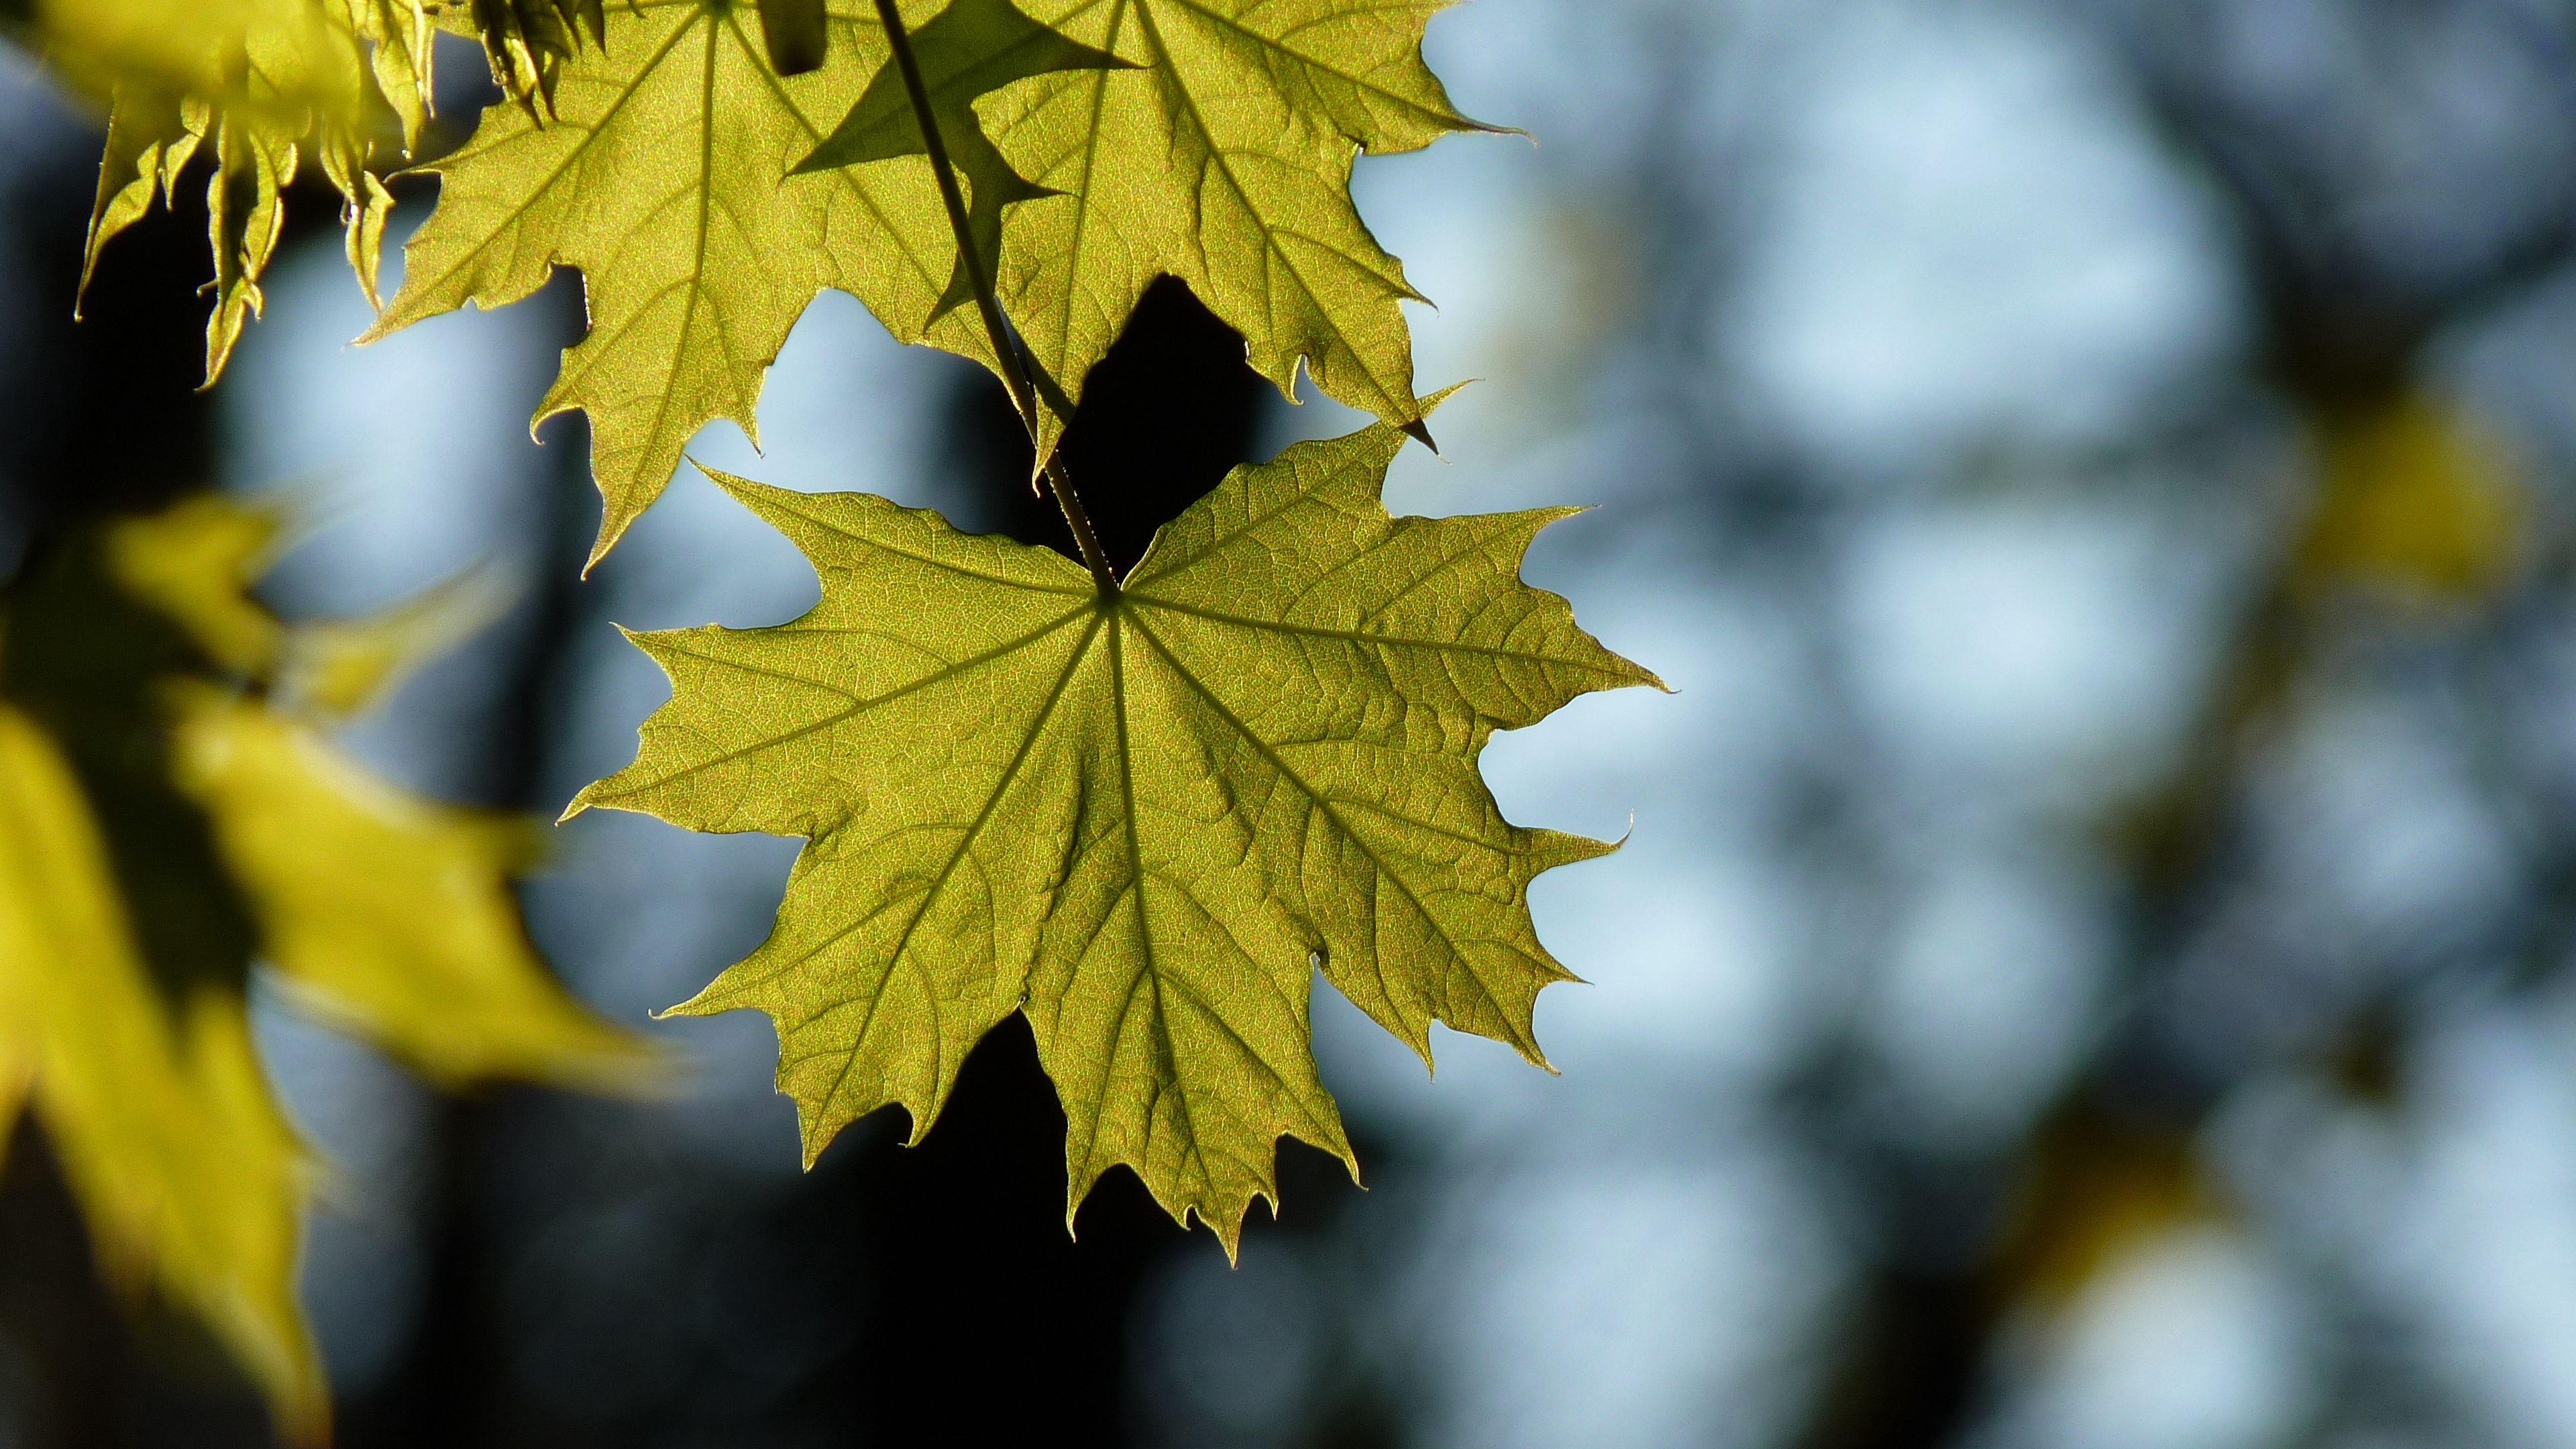 Maple Leaf Blur 4k Maple Leaf Blur Leaves Plant Leaves Nature Wallpaper